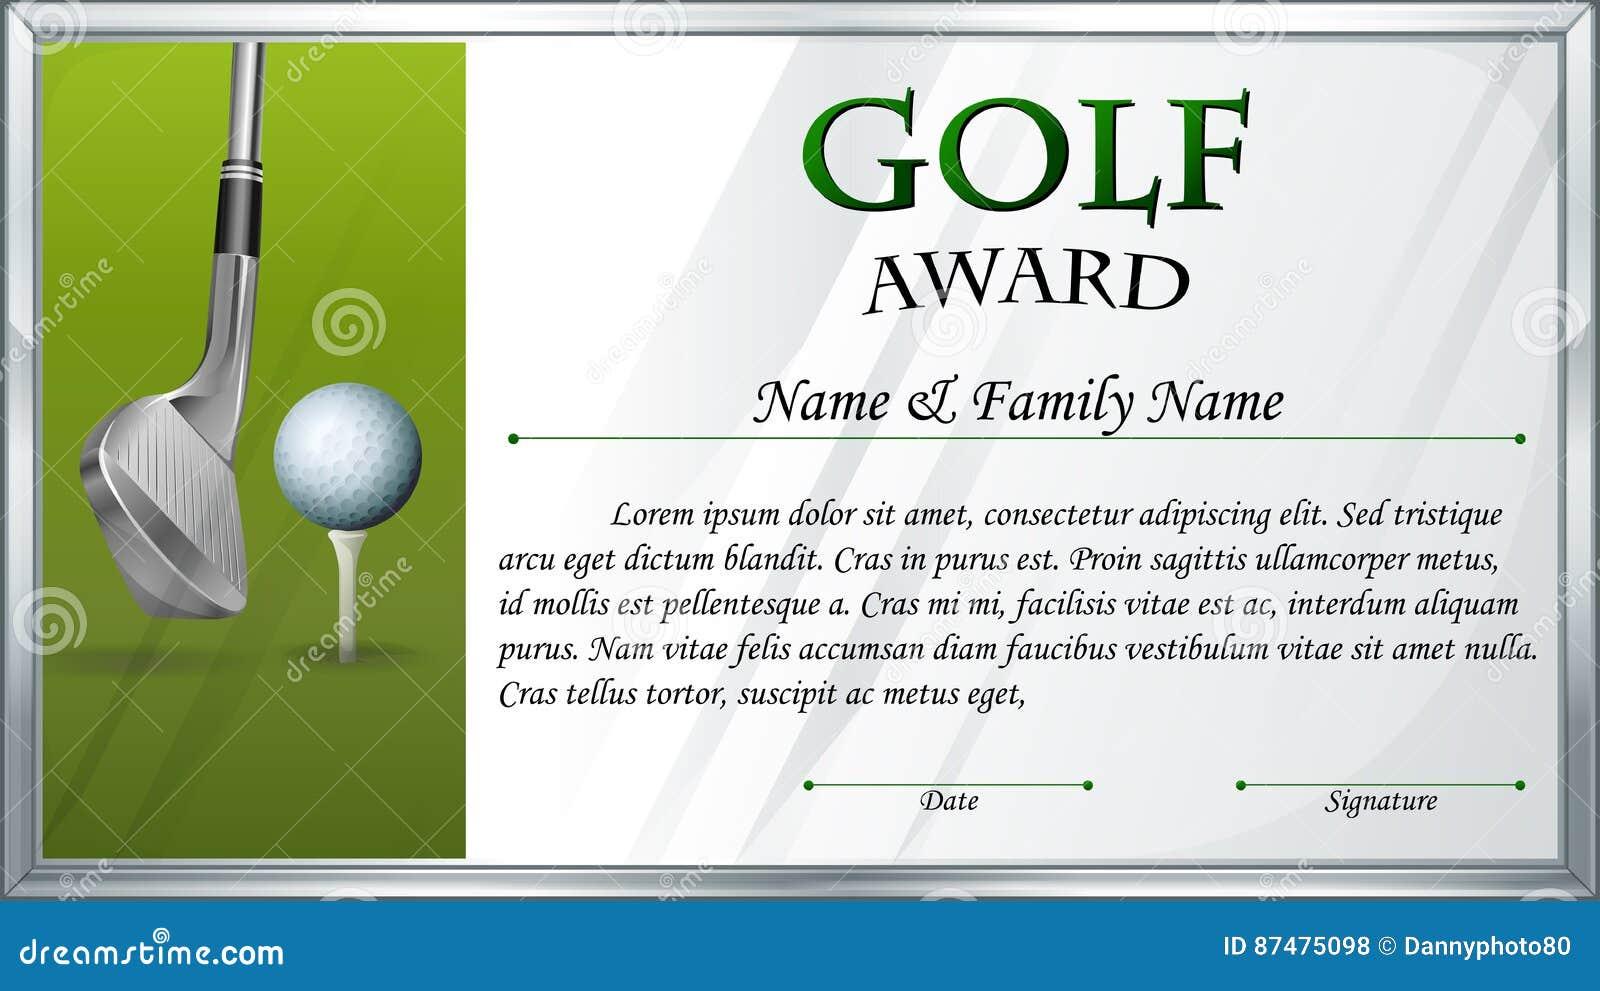 Шаблон сертификата для награды гольфа